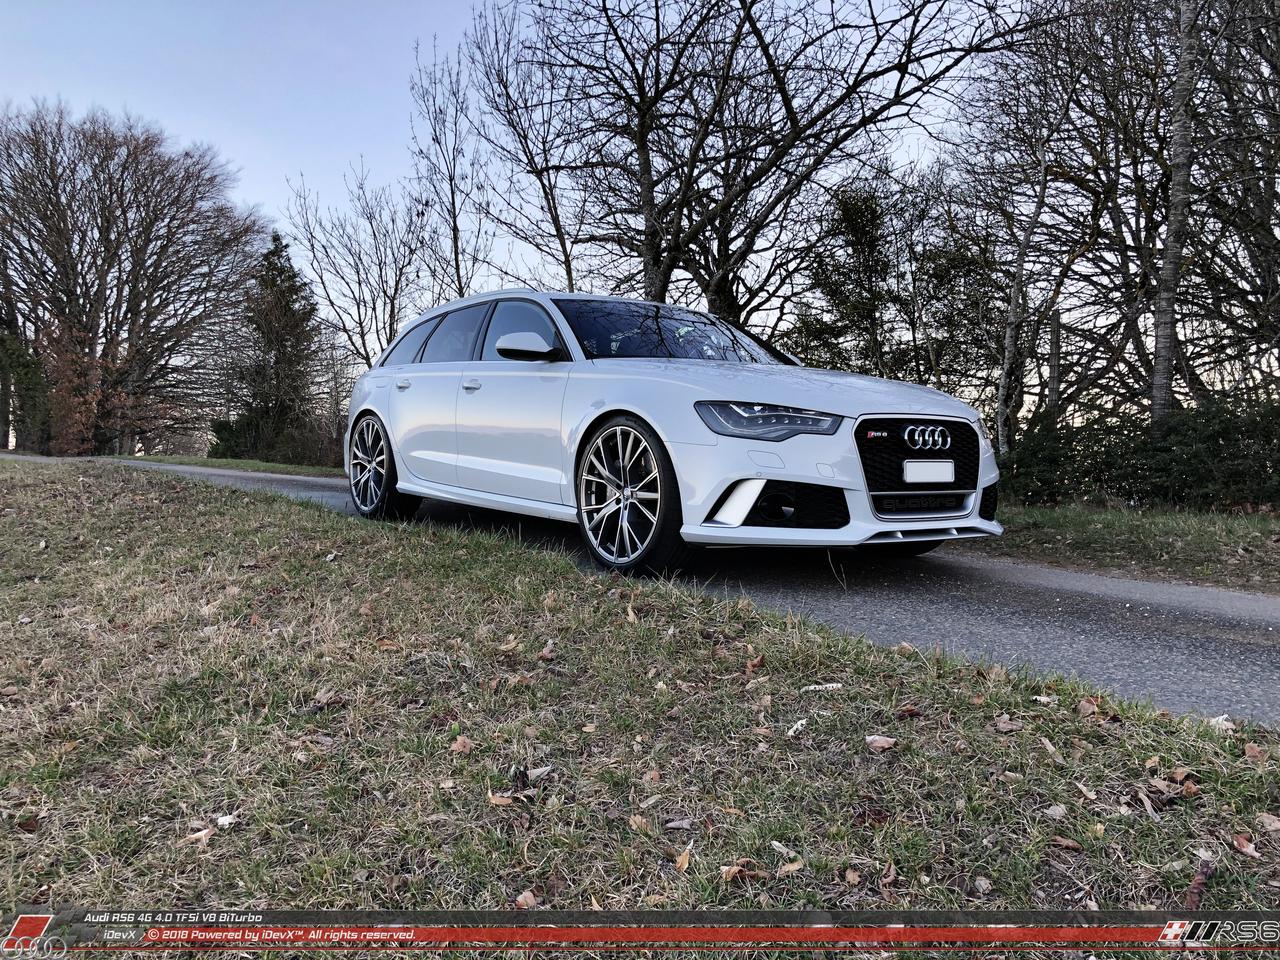 22_02.2019_Audi-RS6_iDevX_001.png